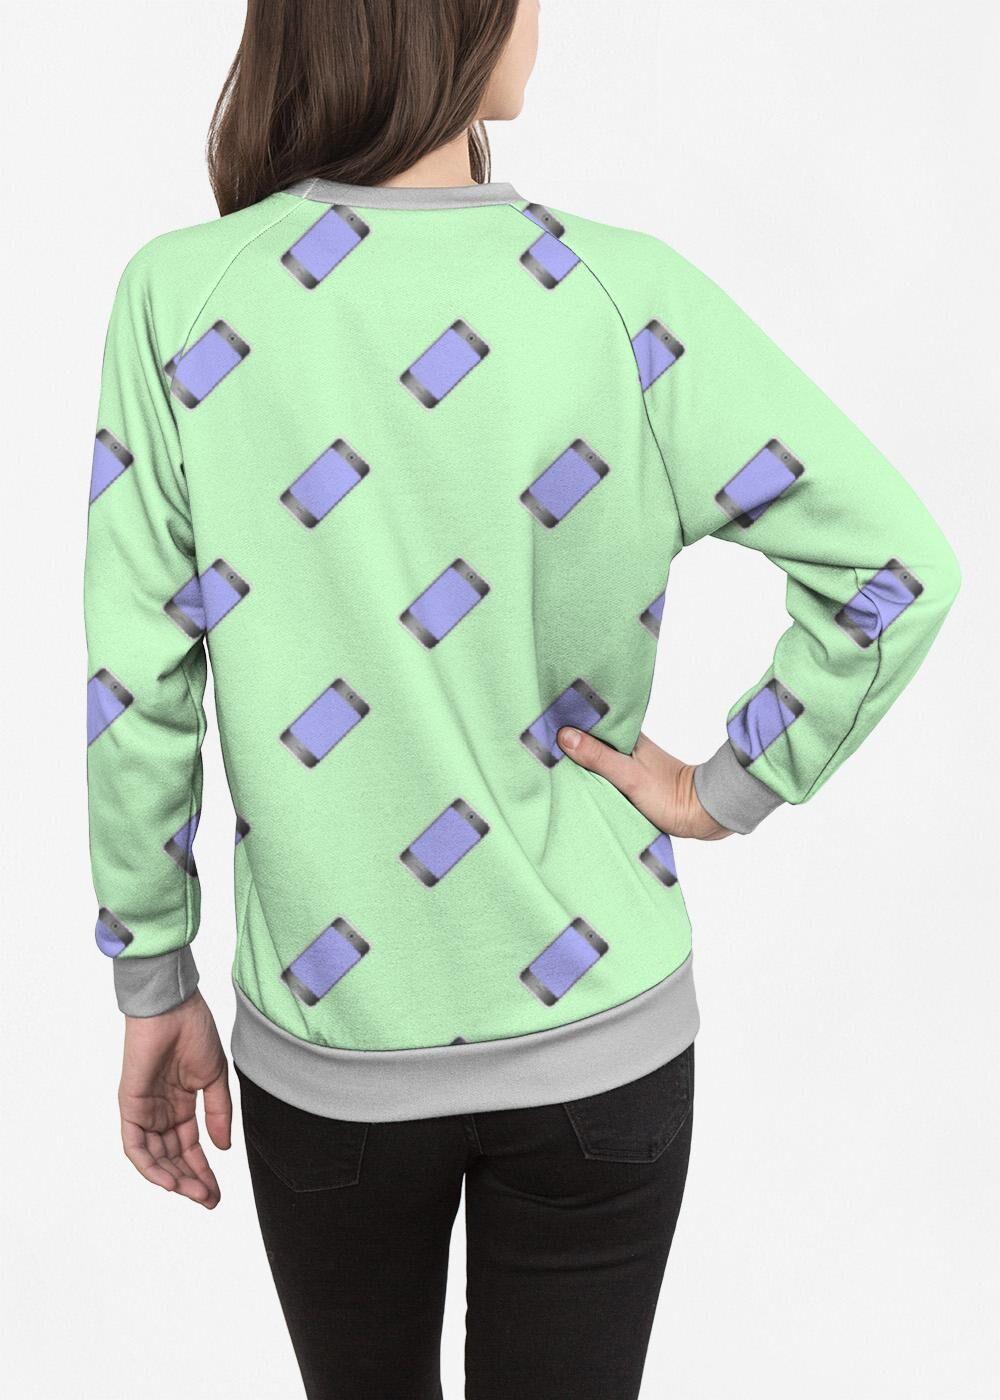 VIDA Women's Crewneck Sweatshirt - Mobile Phones On Green in Green by VIDA Original Artist  - Size: Medium